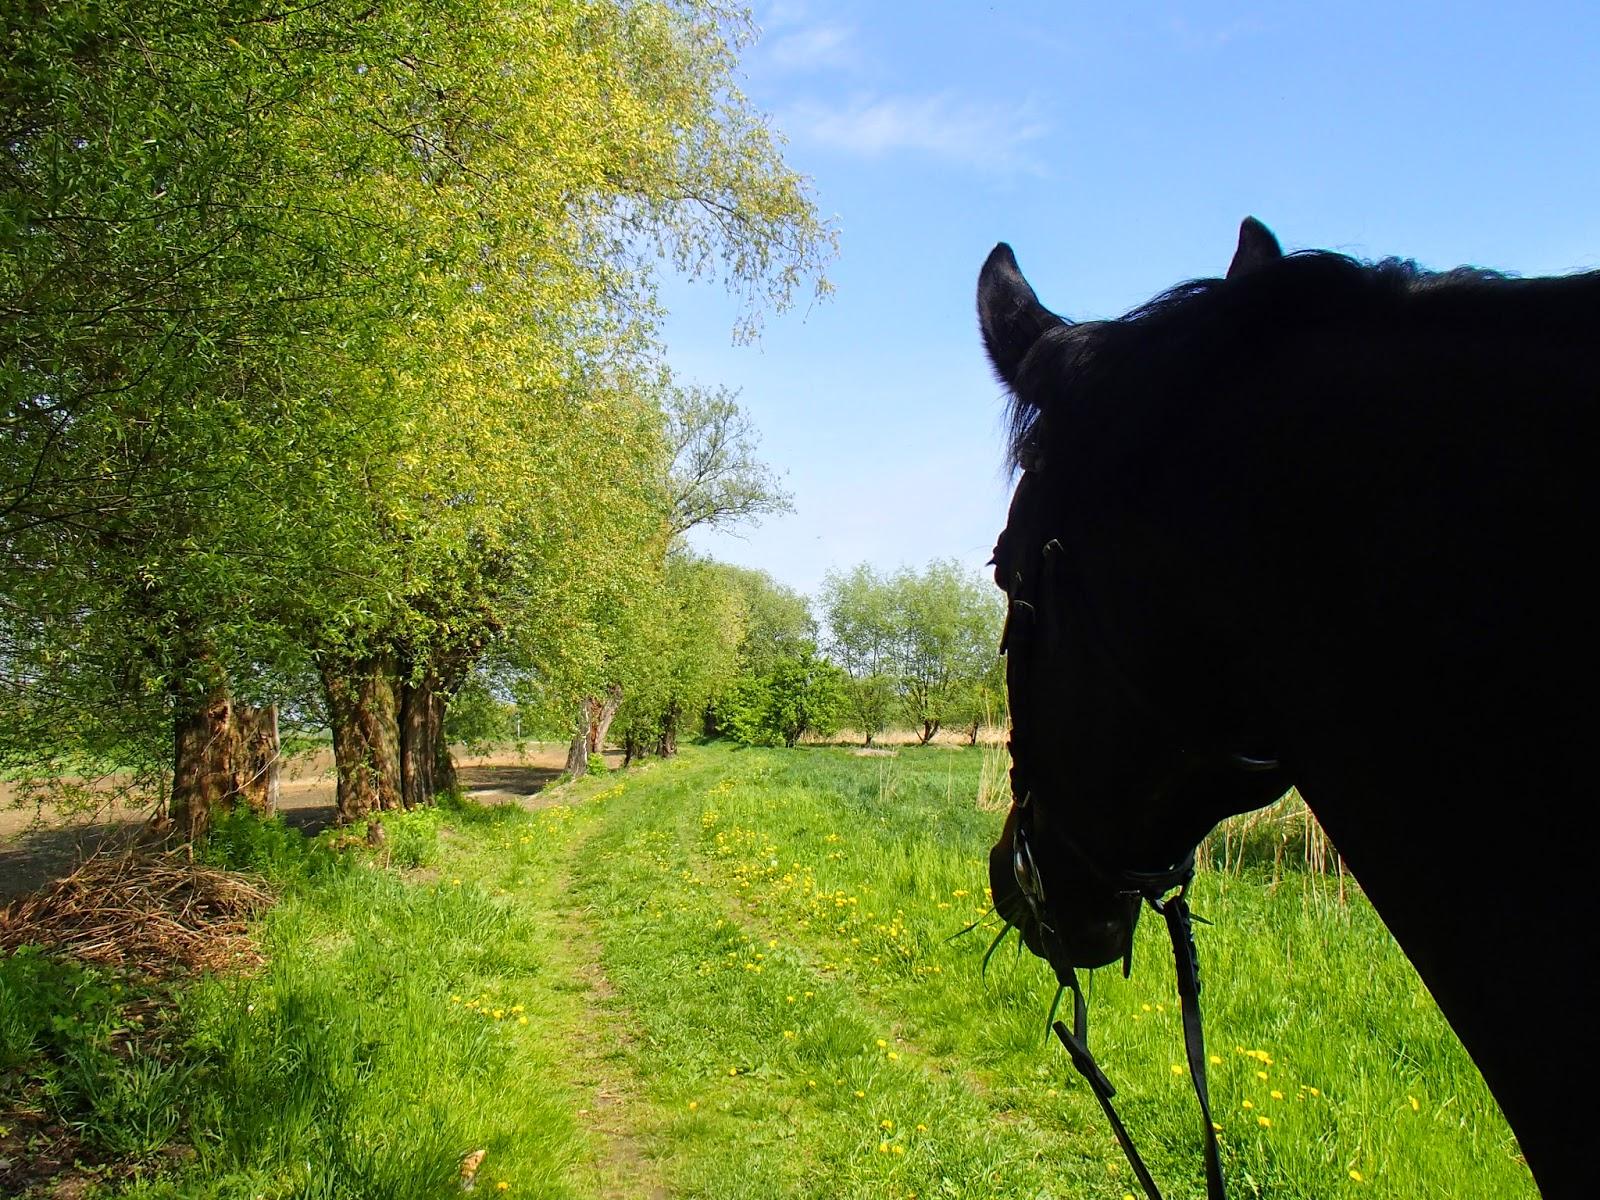 konie, jazda konna, teren, Laetiporus sulphureus żółciak siarkowy